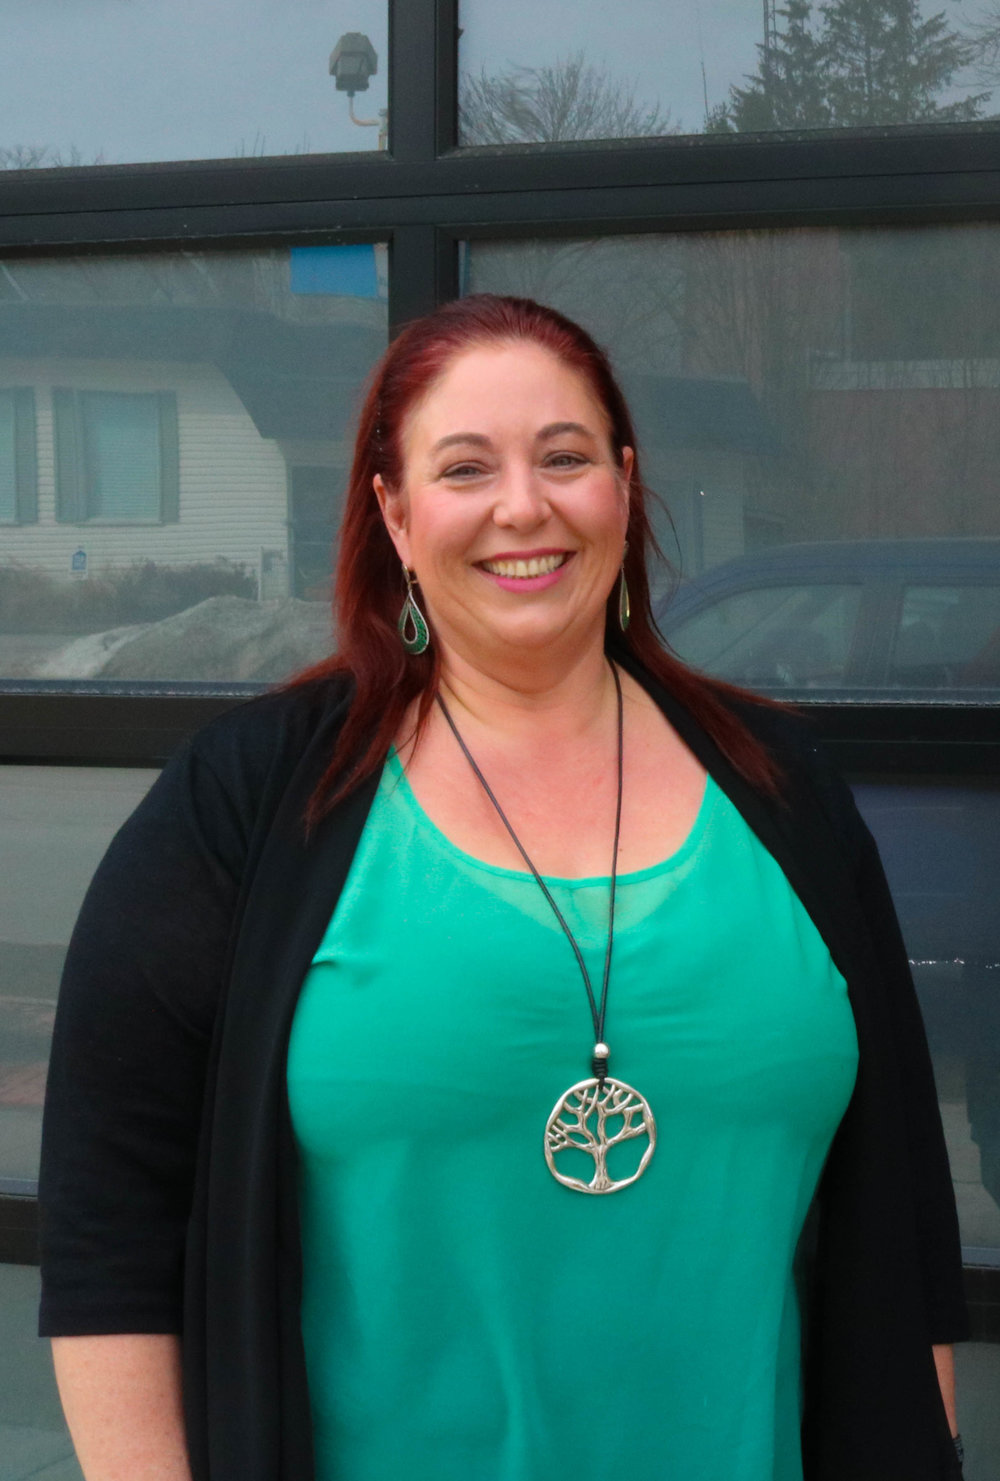 Sarah Cooling, Owner